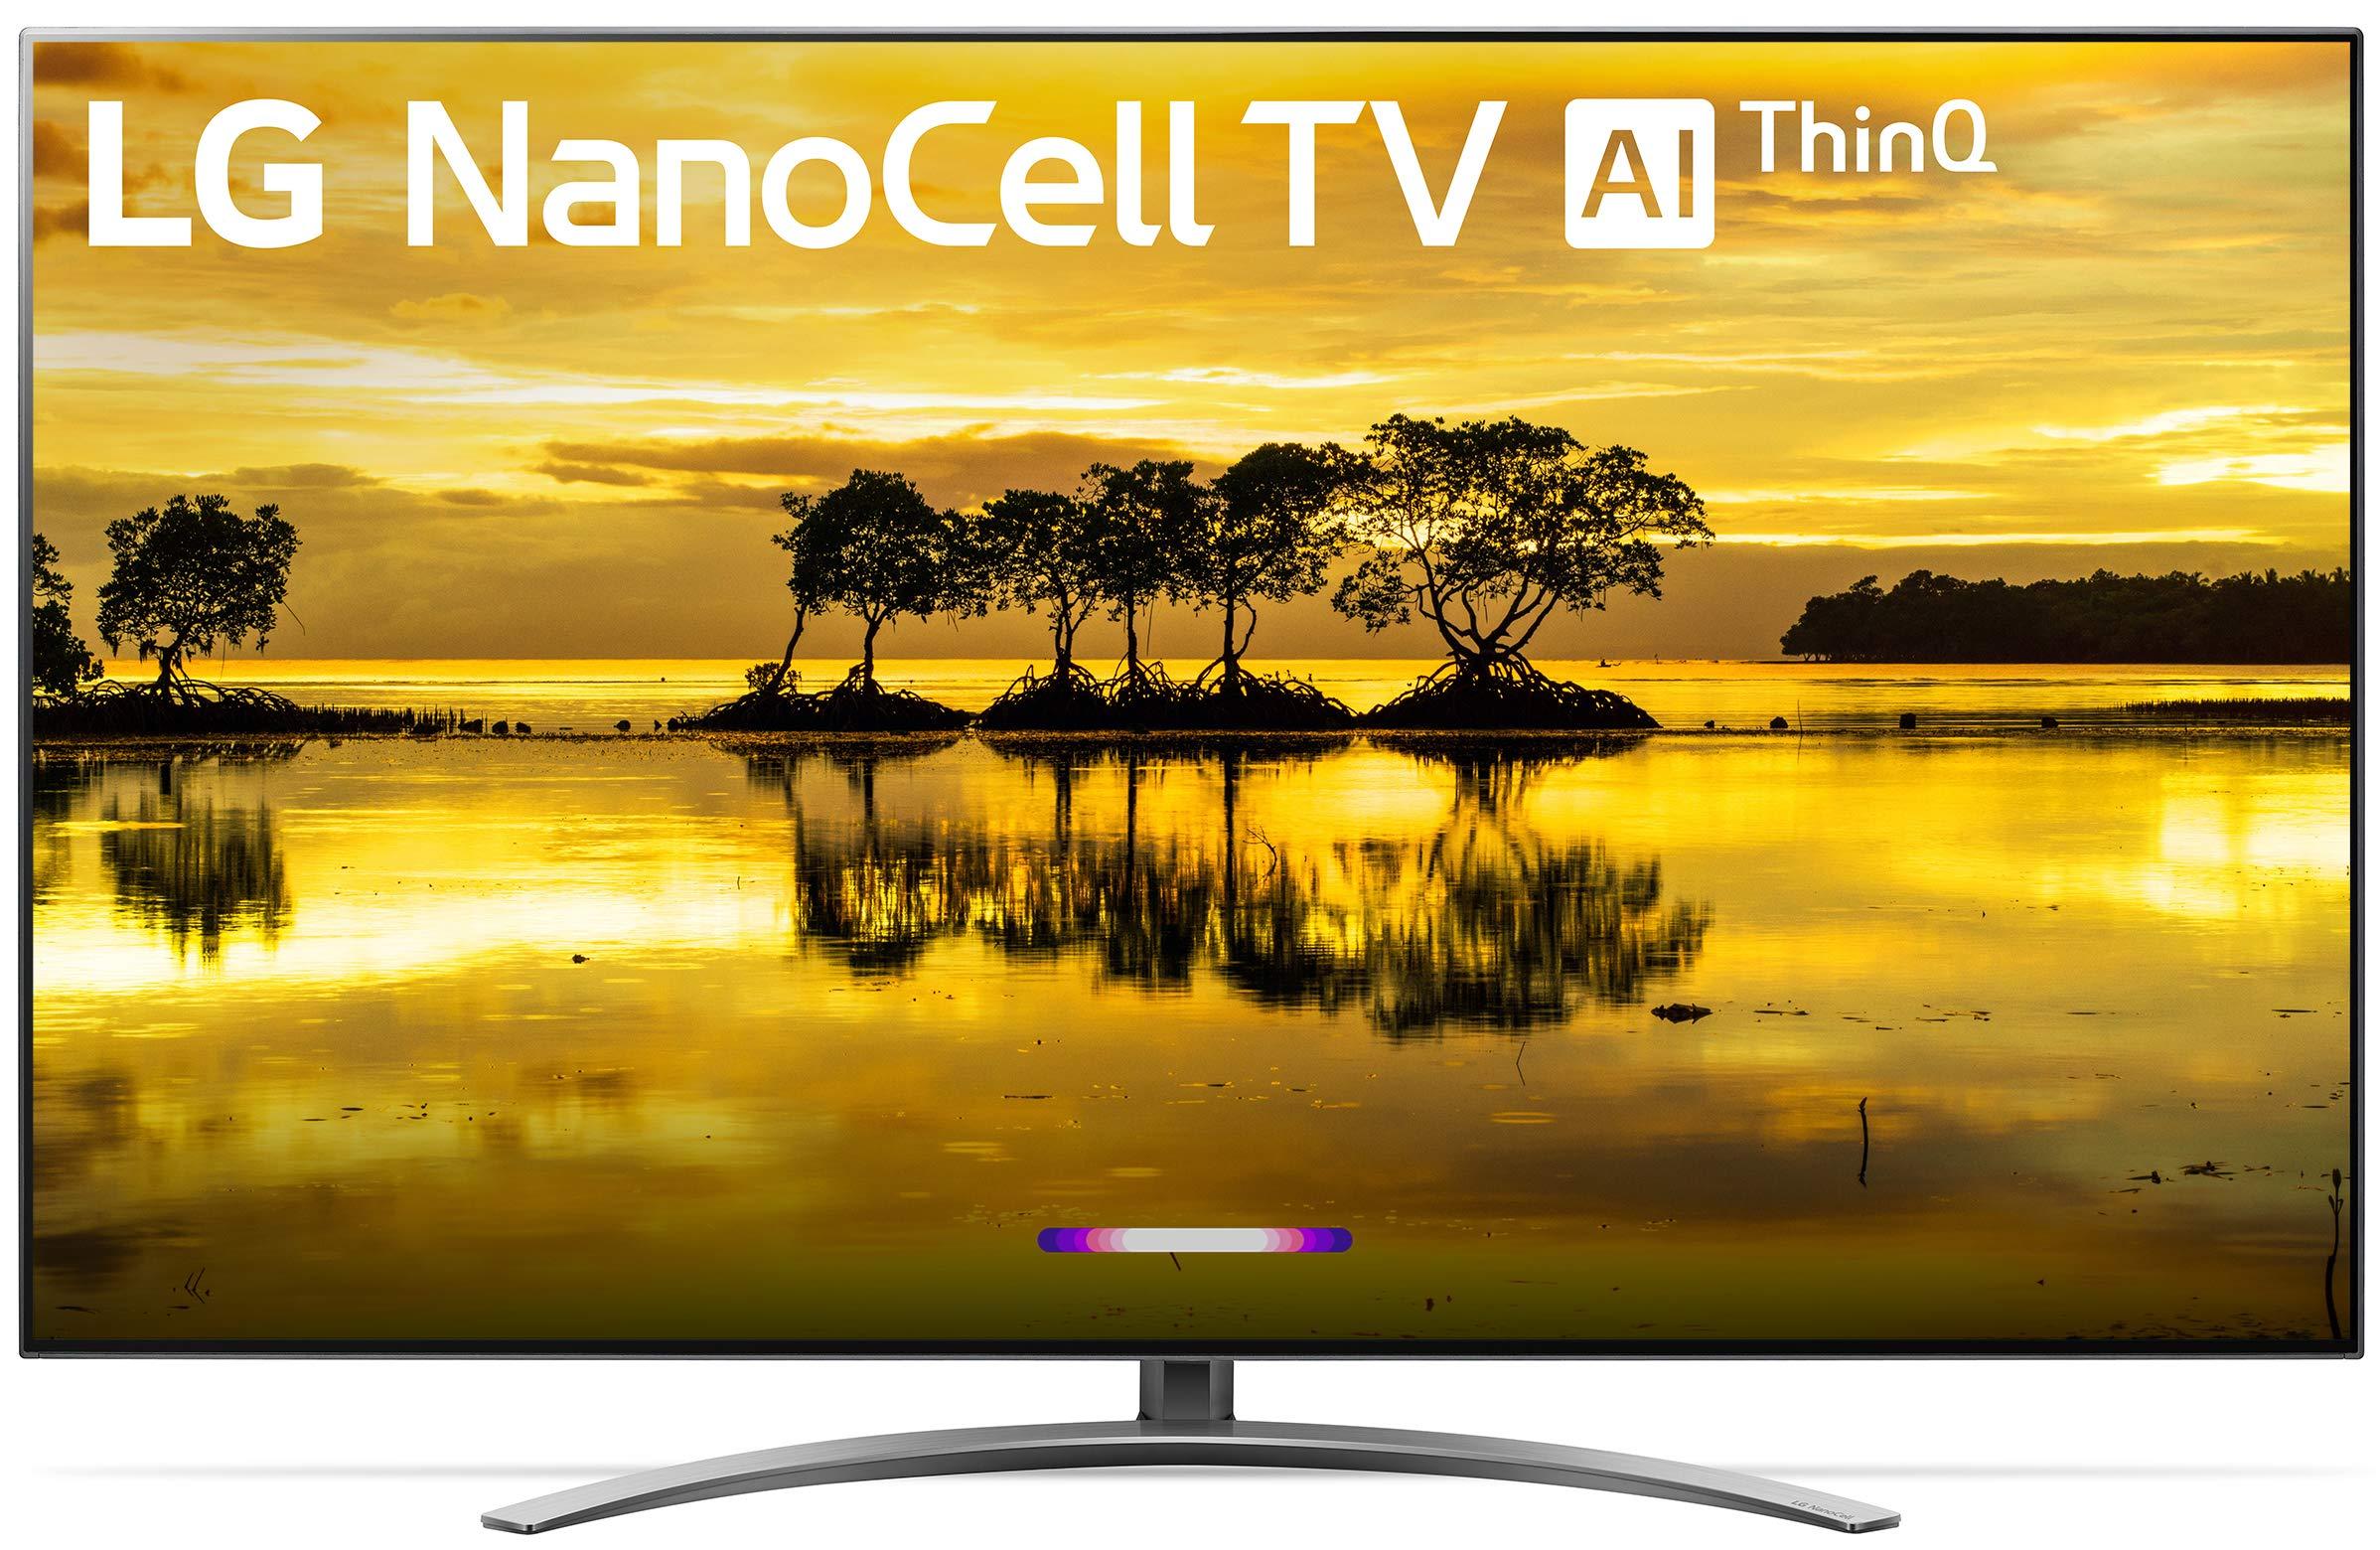 LG 55SM9000PUA Alexa Built-in Nano 9 Series 55'' 4K Ultra HD Smart LED NanoCell TV (2019)